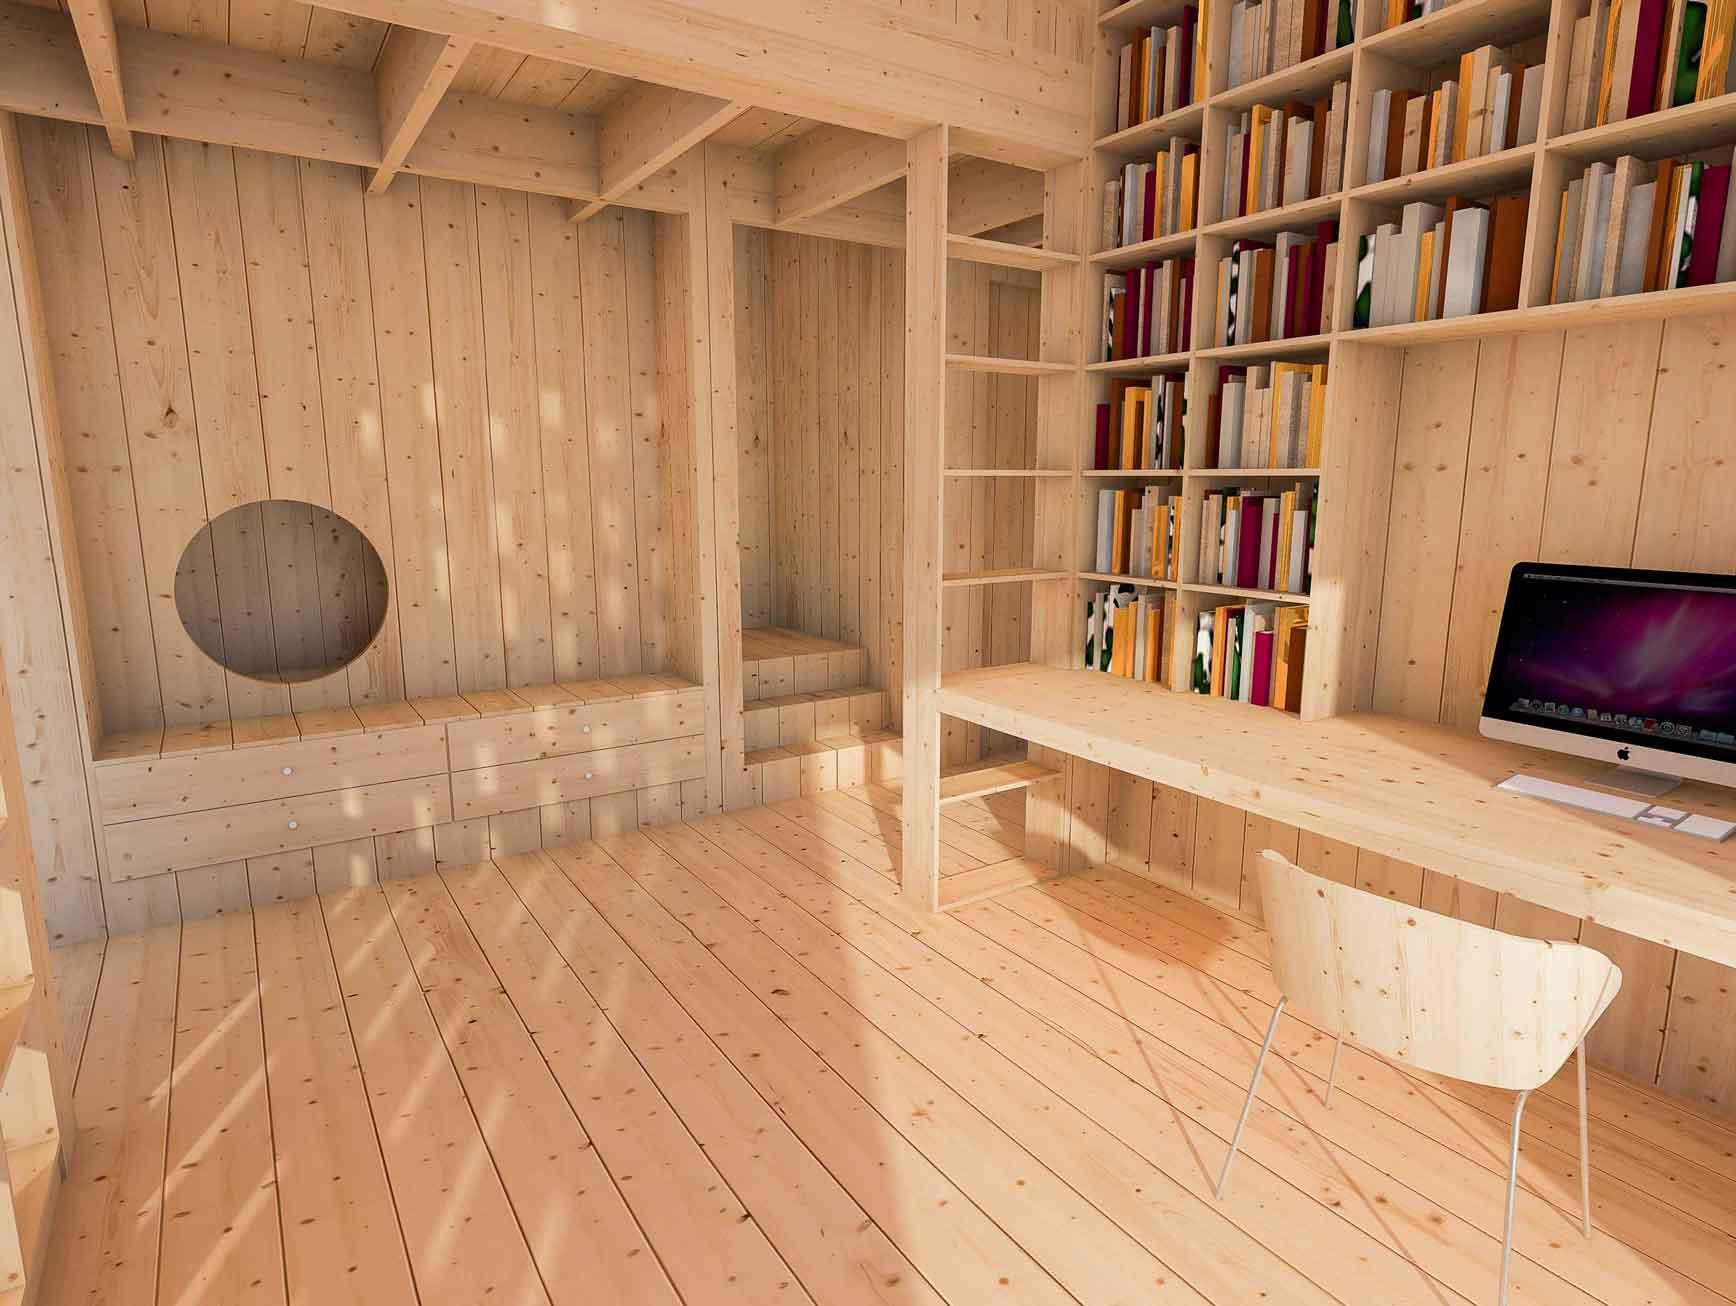 Dům pro jedny architekty - vizualizace interiéru pracovny. Autor: Kurz architekti